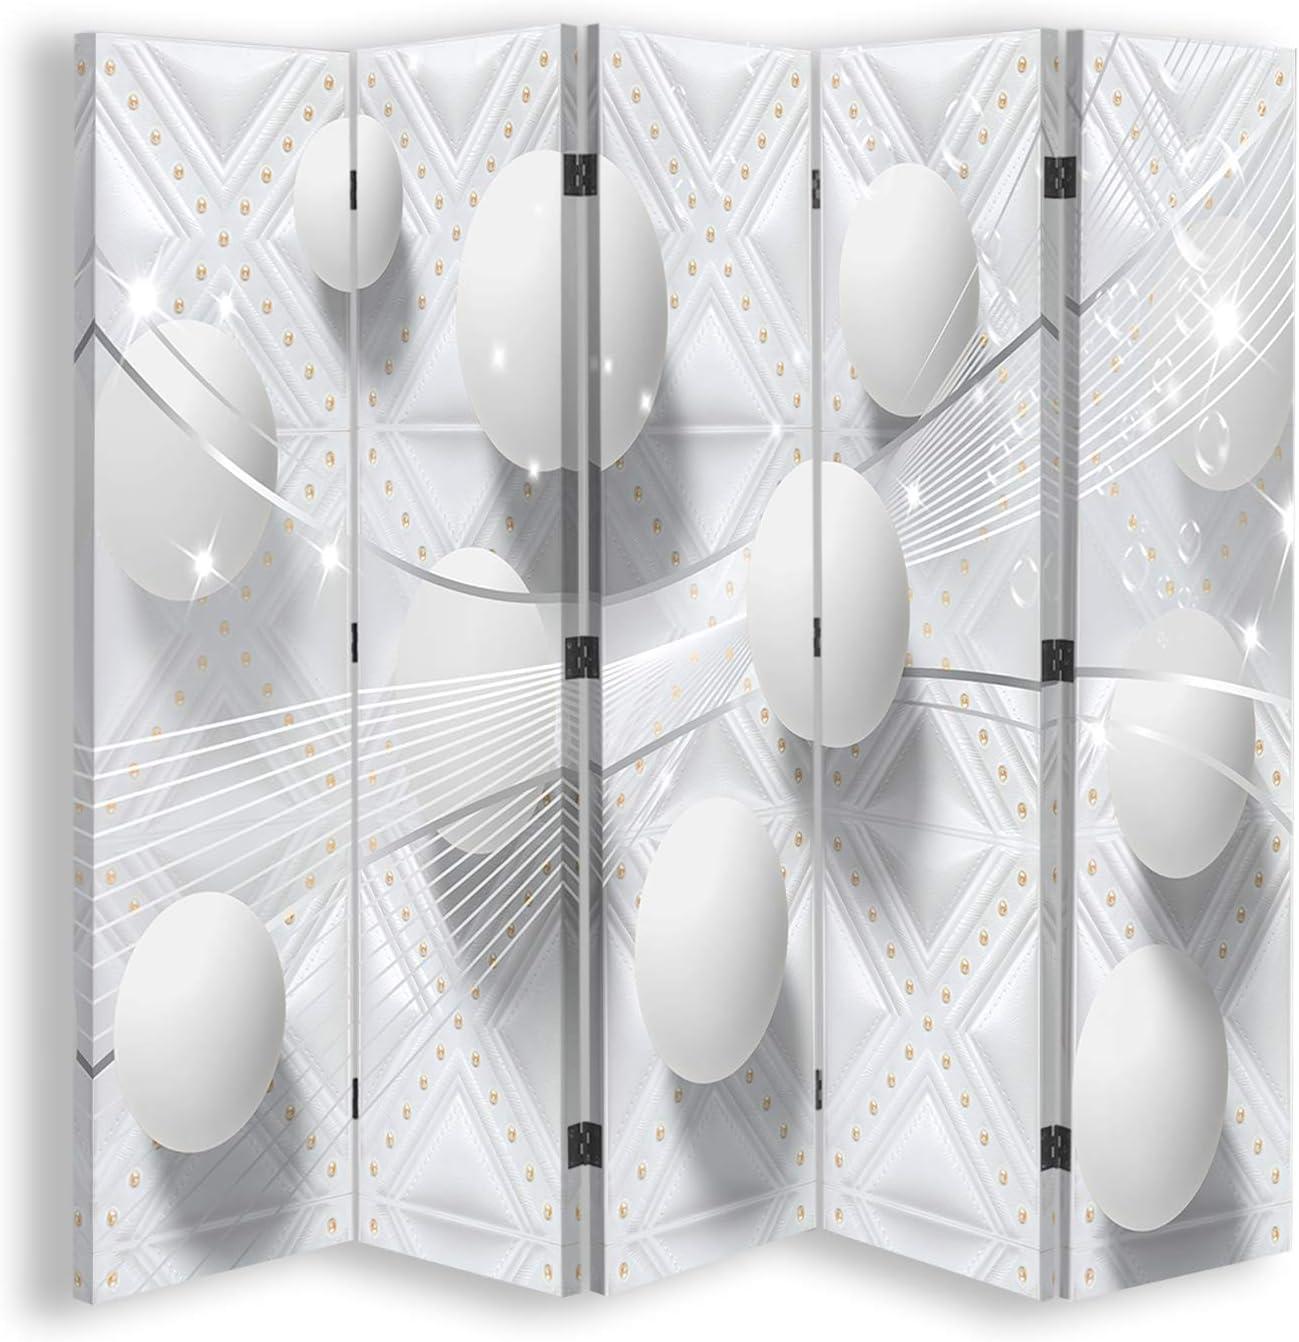 Feeby Foto Biombo Bala 5 Paneles Unilateral Abstracto Blanco 180x170 cm: Amazon.es: Hogar